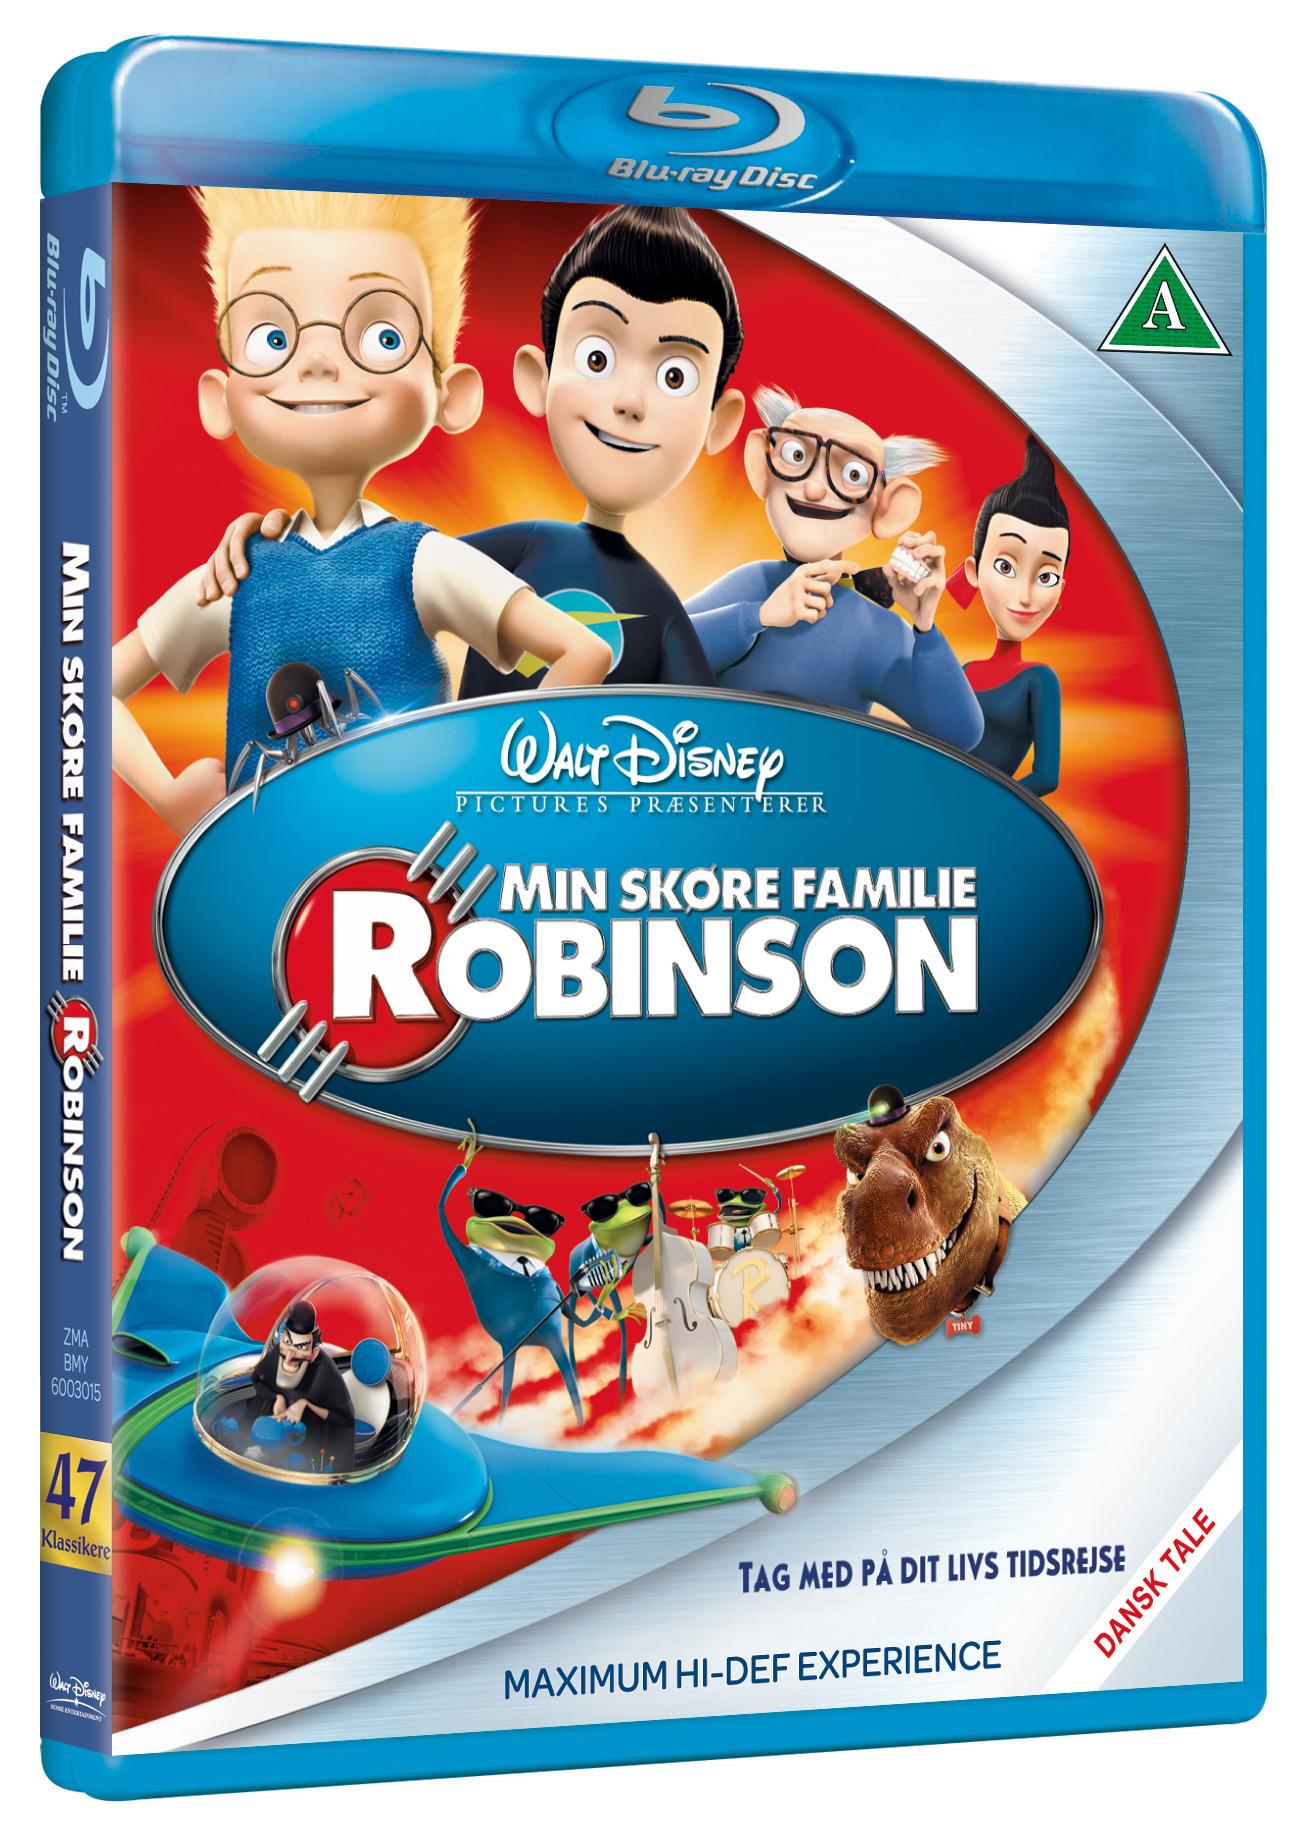 Min skøre familie Robinson Disney classic #47